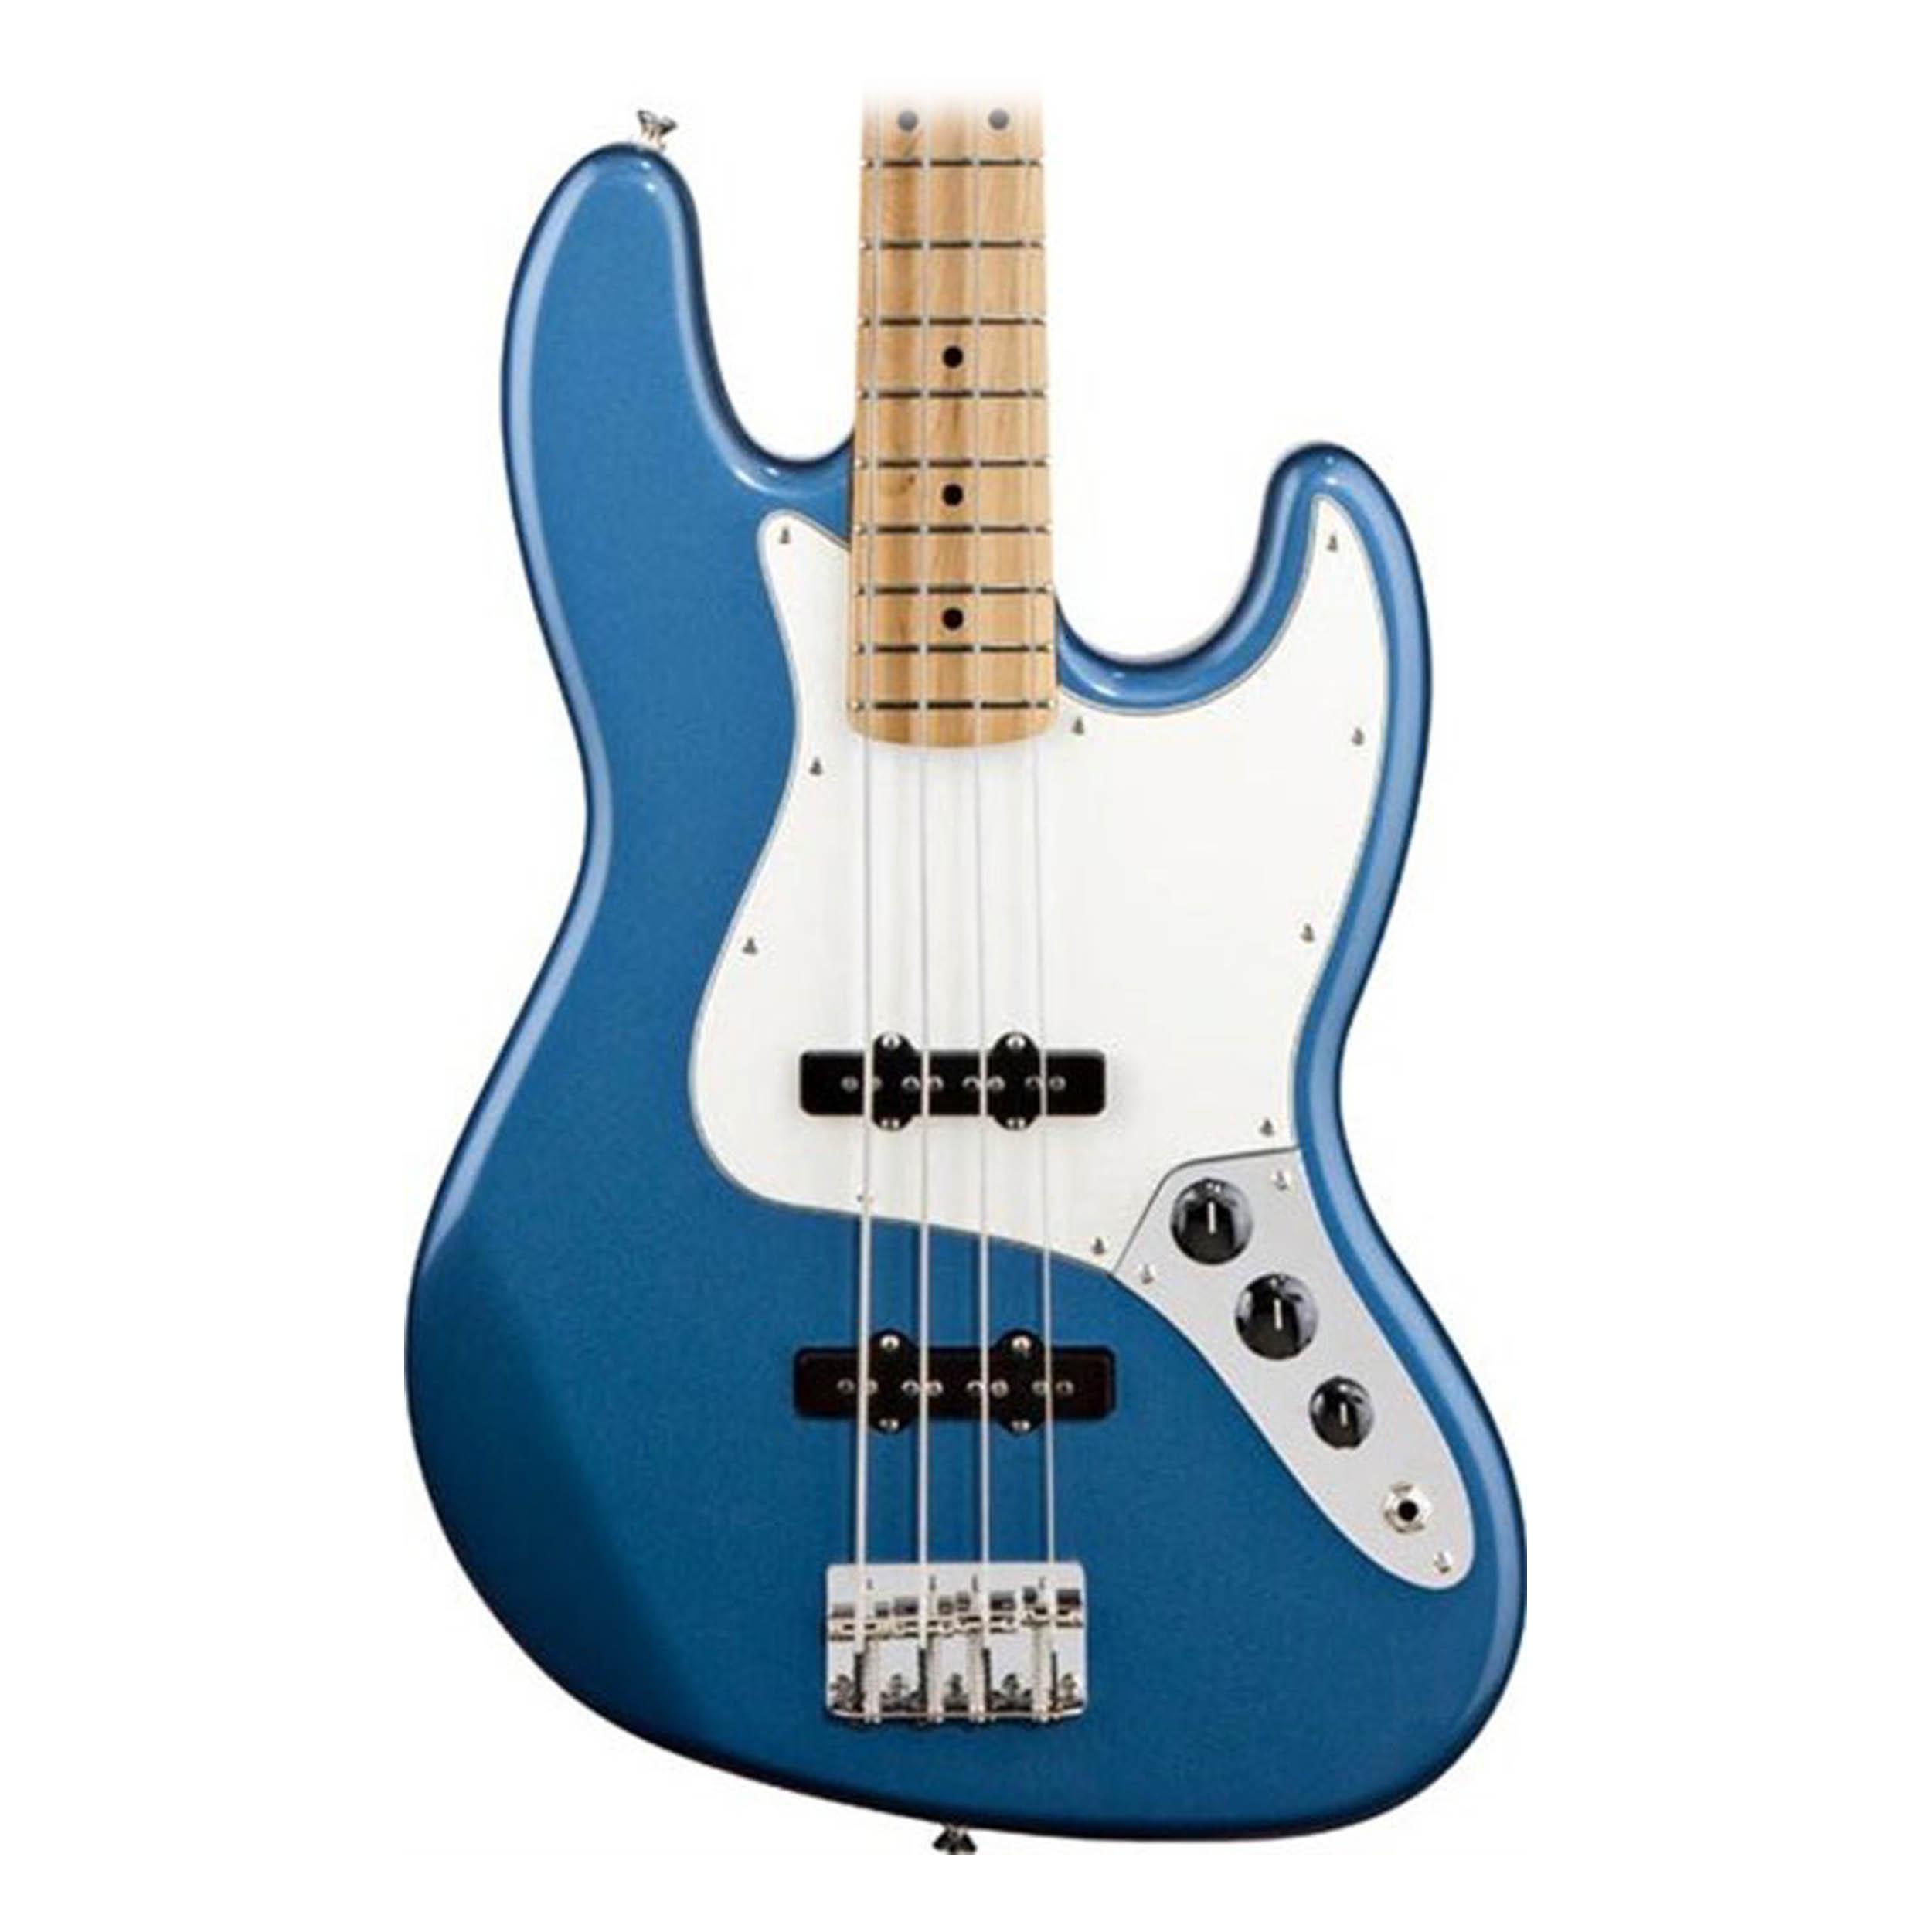 Fender Mexican Standard Jazz Bass Lake Placid Blue Guitar